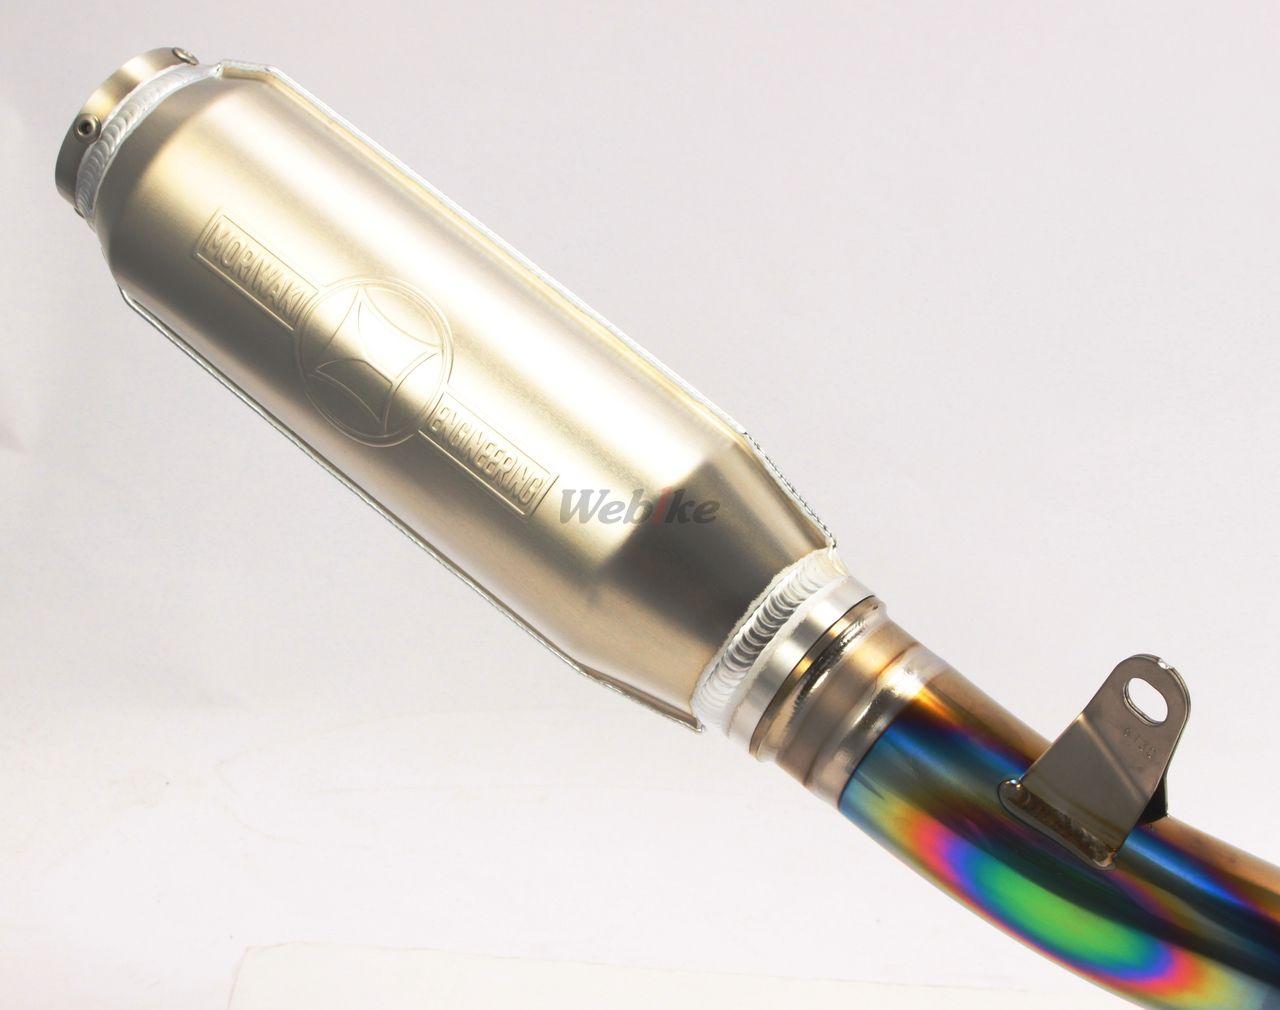 【MORIWAKI】TITAN MONSTER 全段排氣管 RACING - 「Webike-摩托百貨」